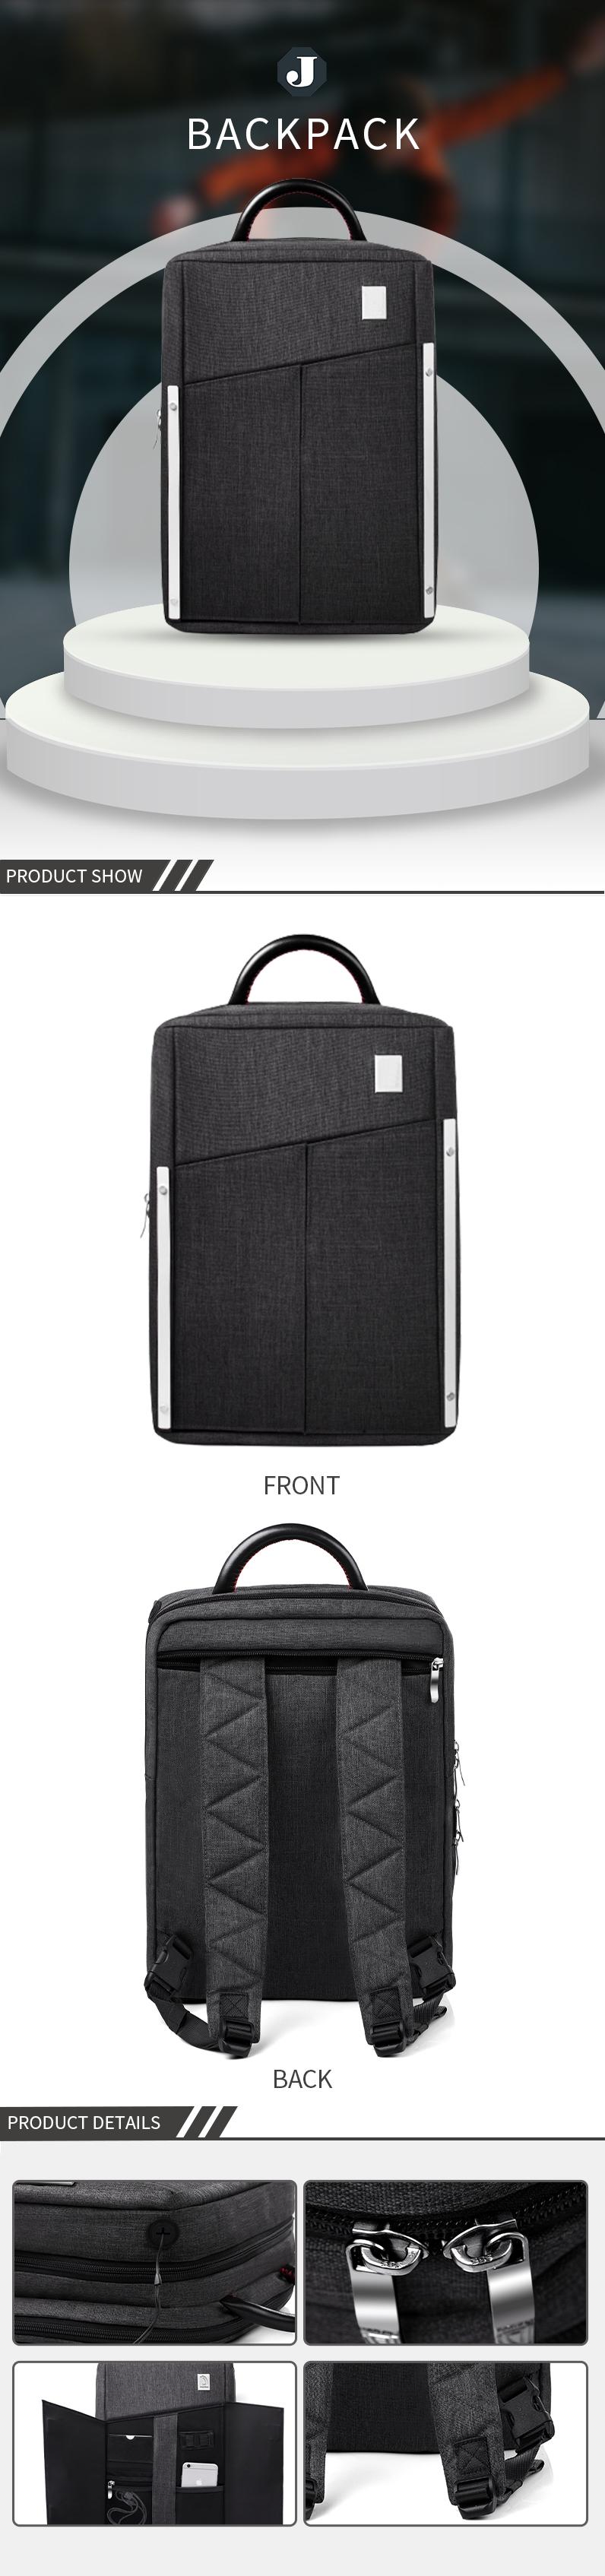 Business bag-001M.jpg